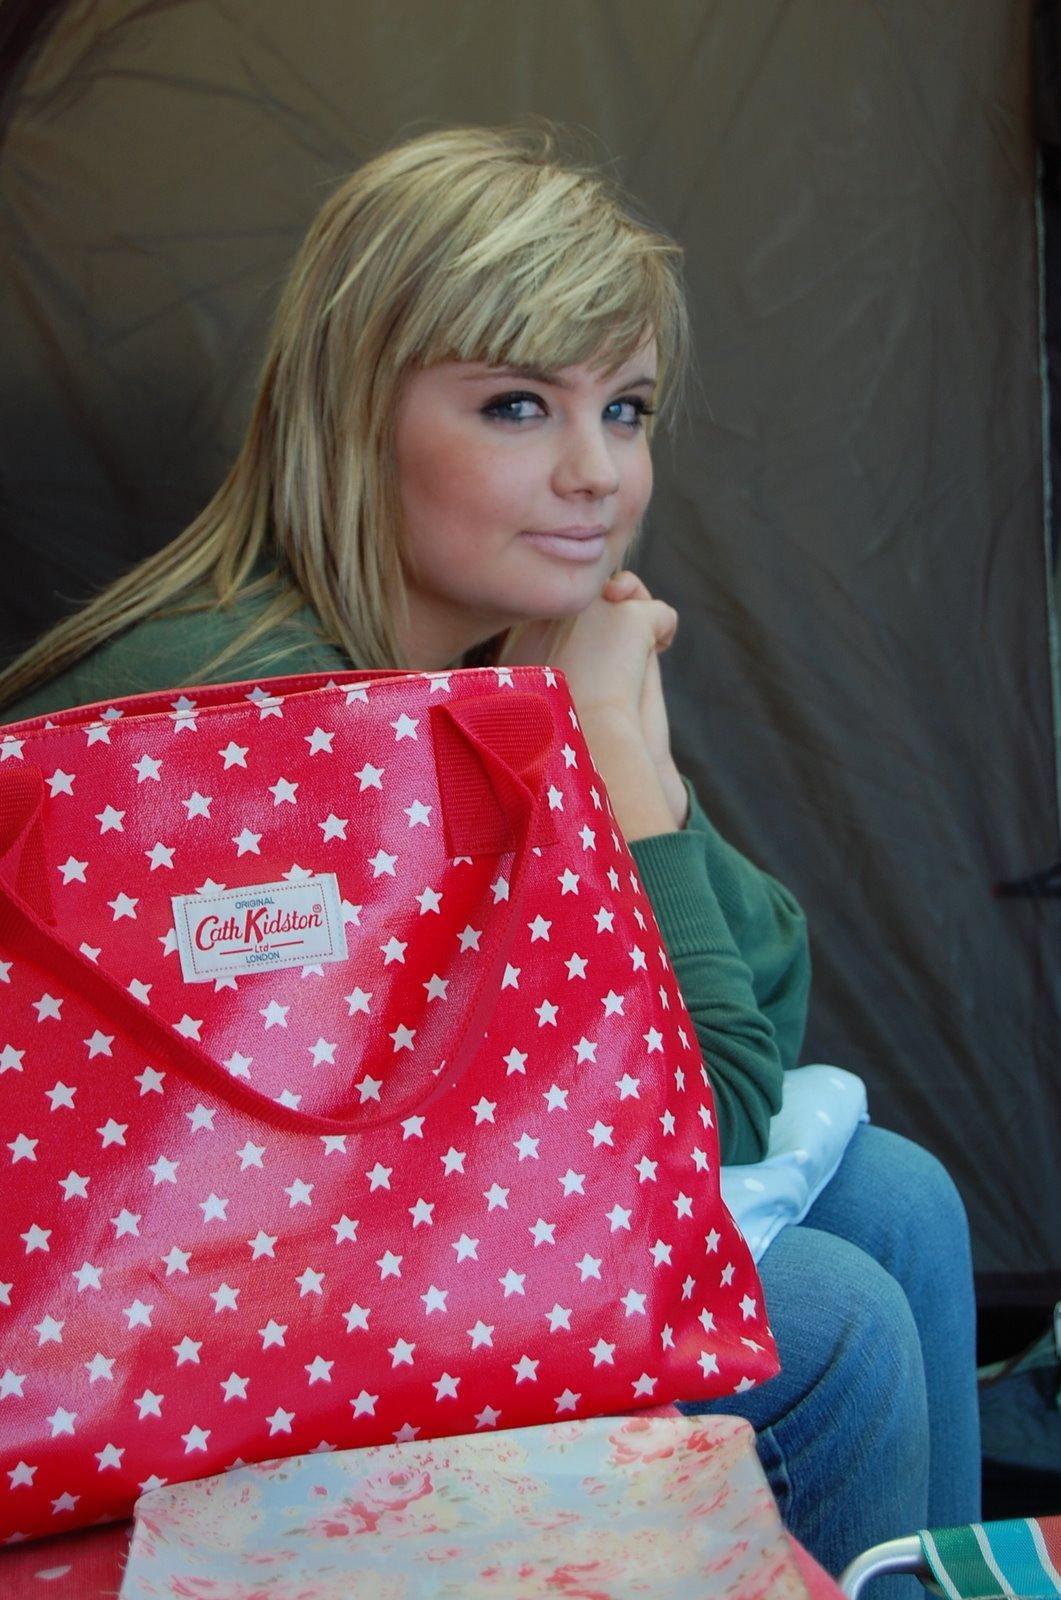 Cath Kidston star bag